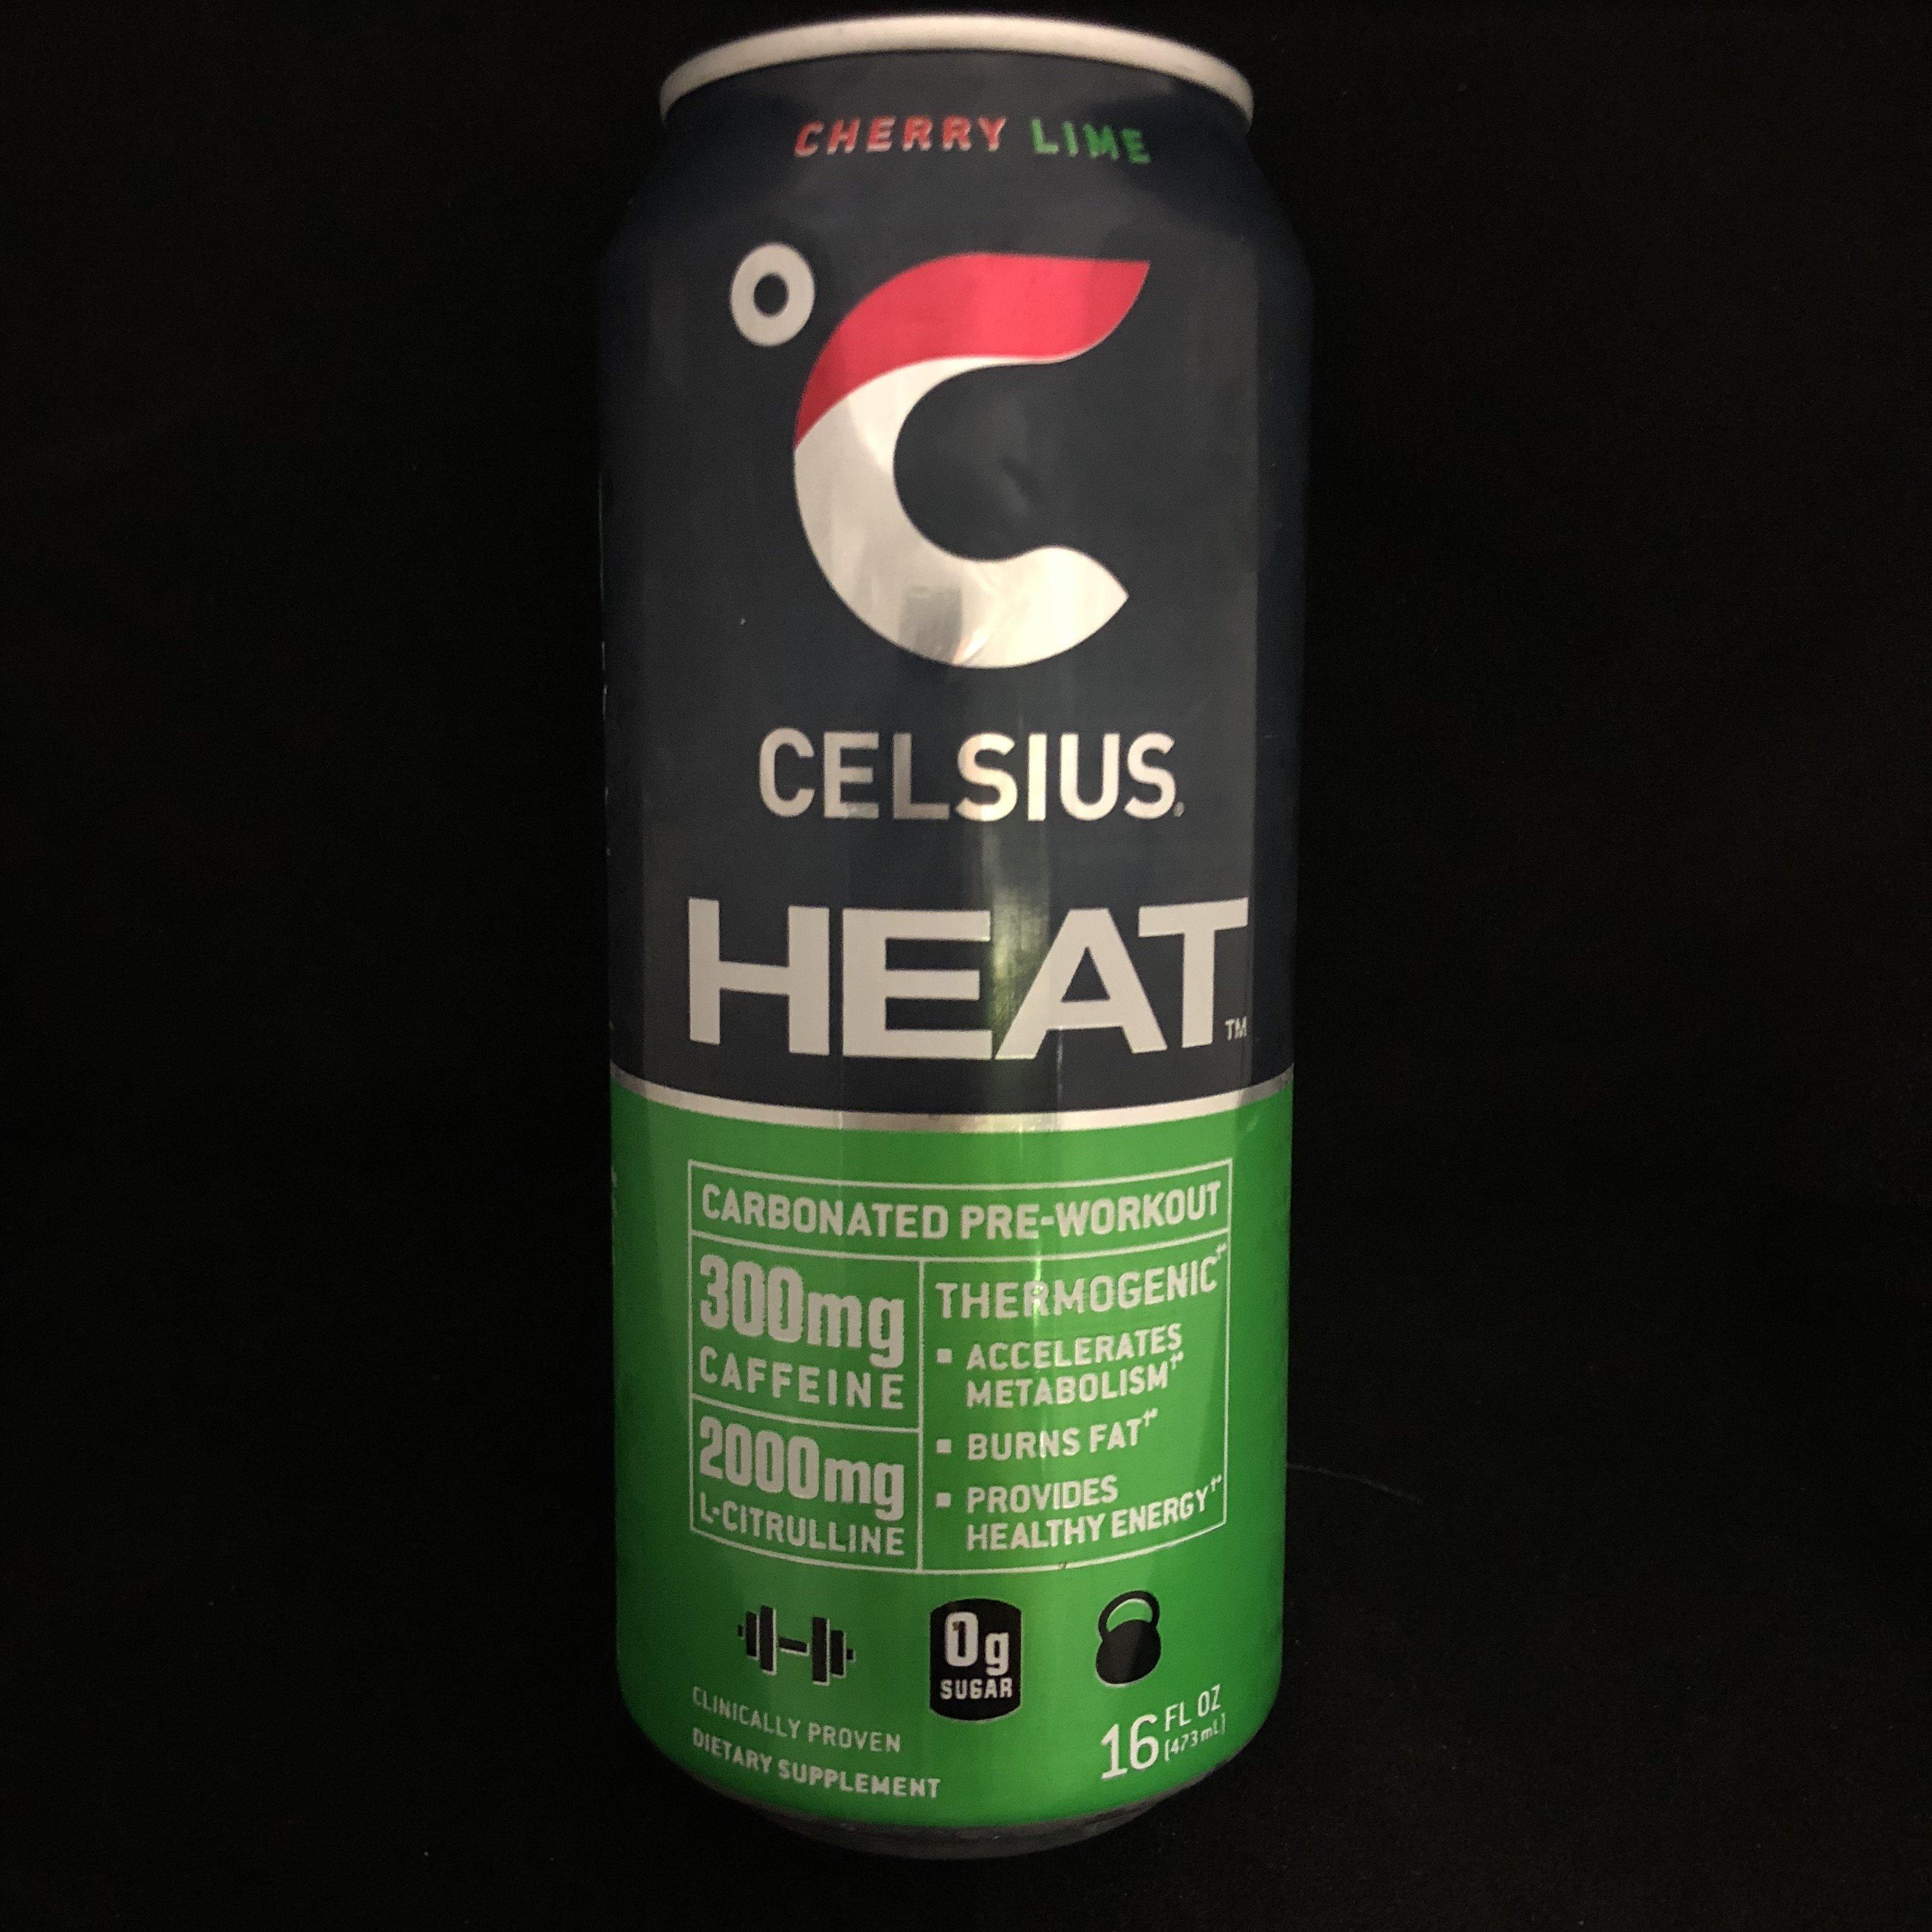 Celsius HEAT S7ZPSDP5VJX67RHJG4I3UZQ4